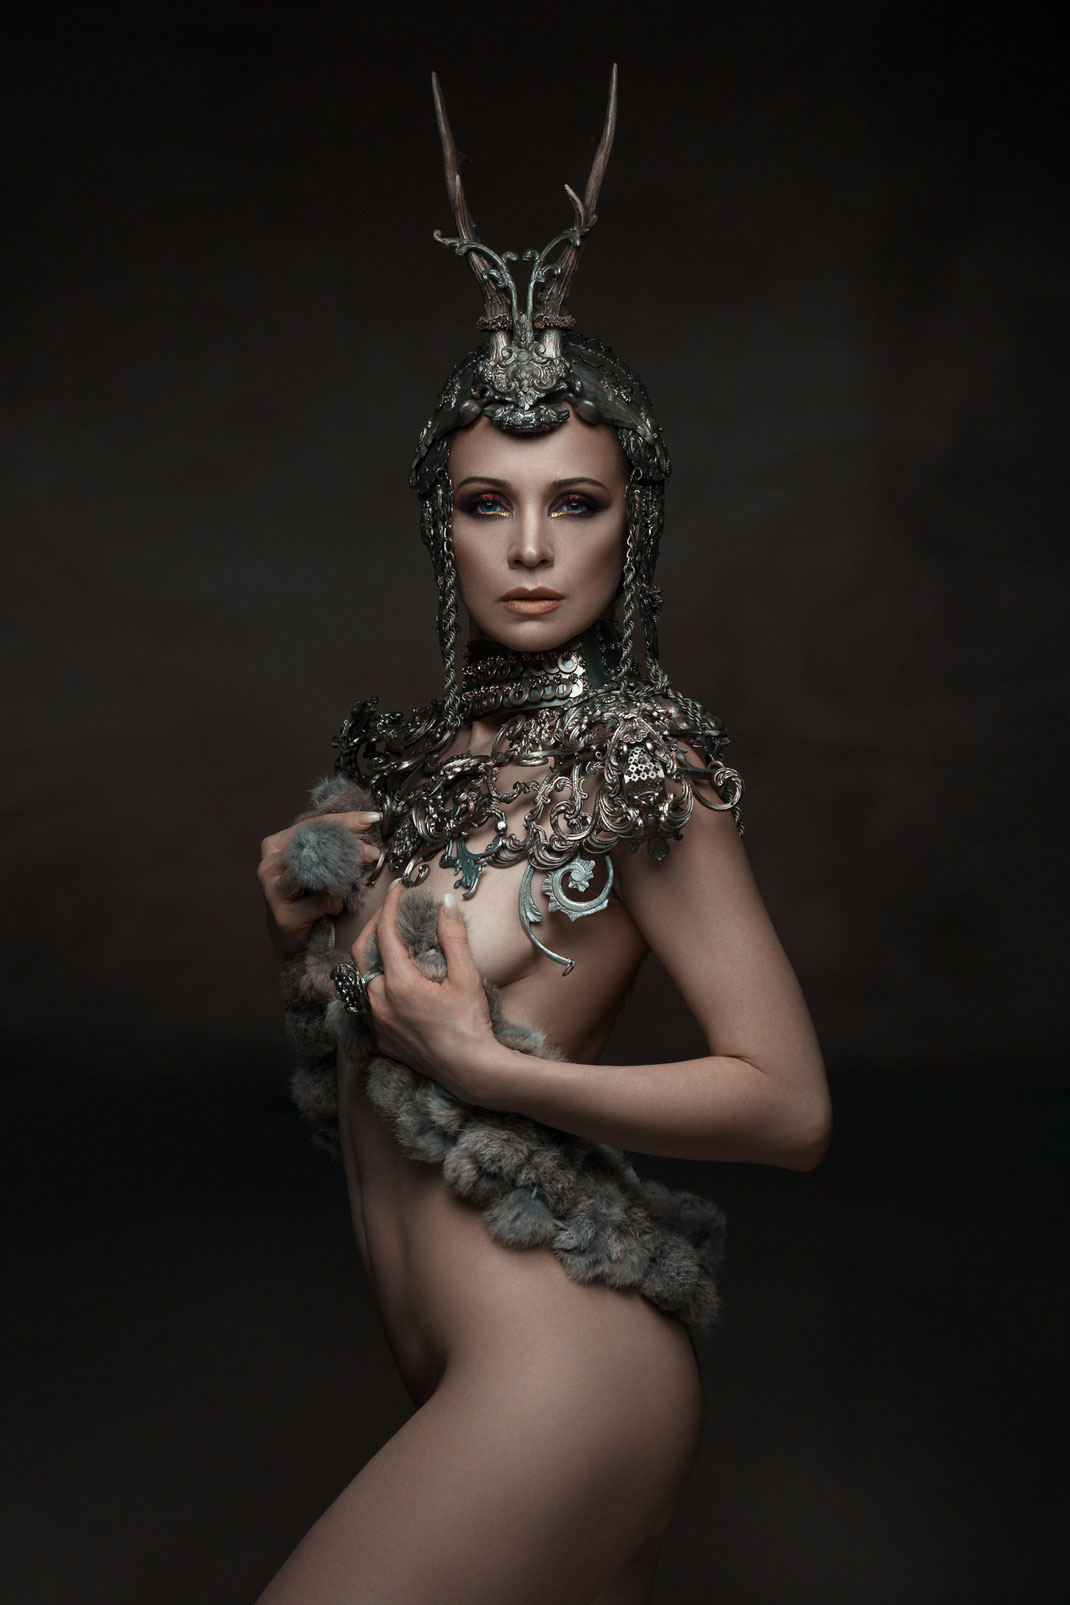 The Song of the Nibelungs - Angélique - Markus Hertzsch - Art - Model - Martine Brun - Jewelry - Body - Iron - Queen - Knight - Portrait